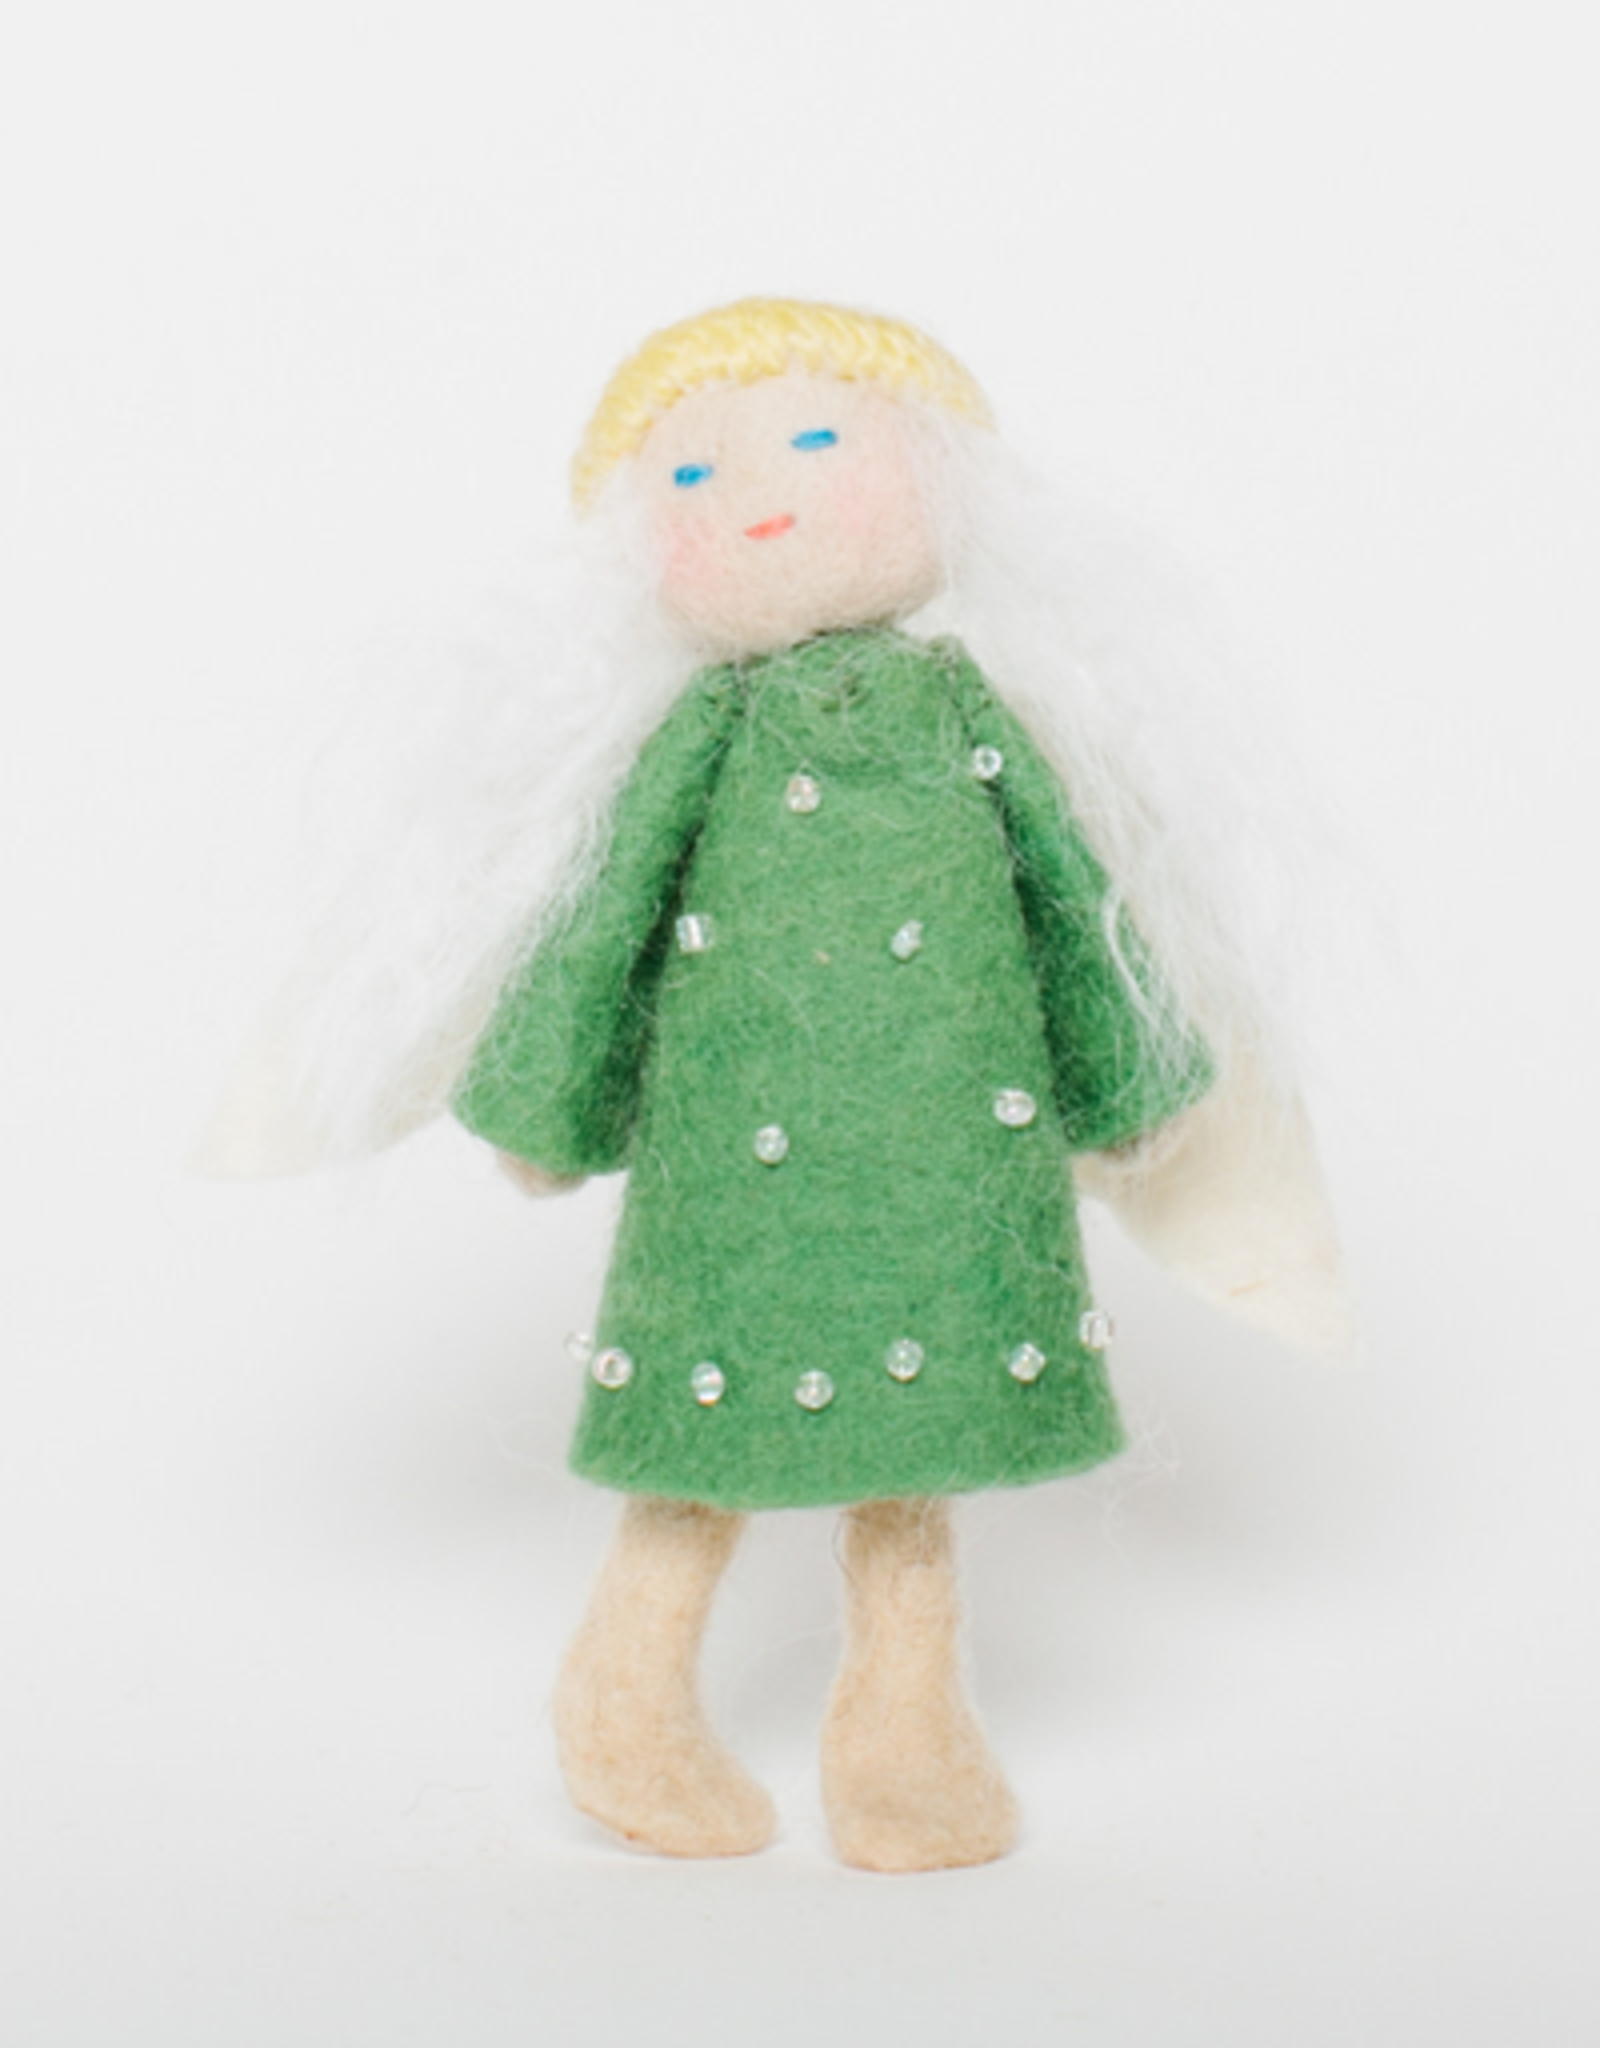 Flying Vintage Angel Ornament - Pine